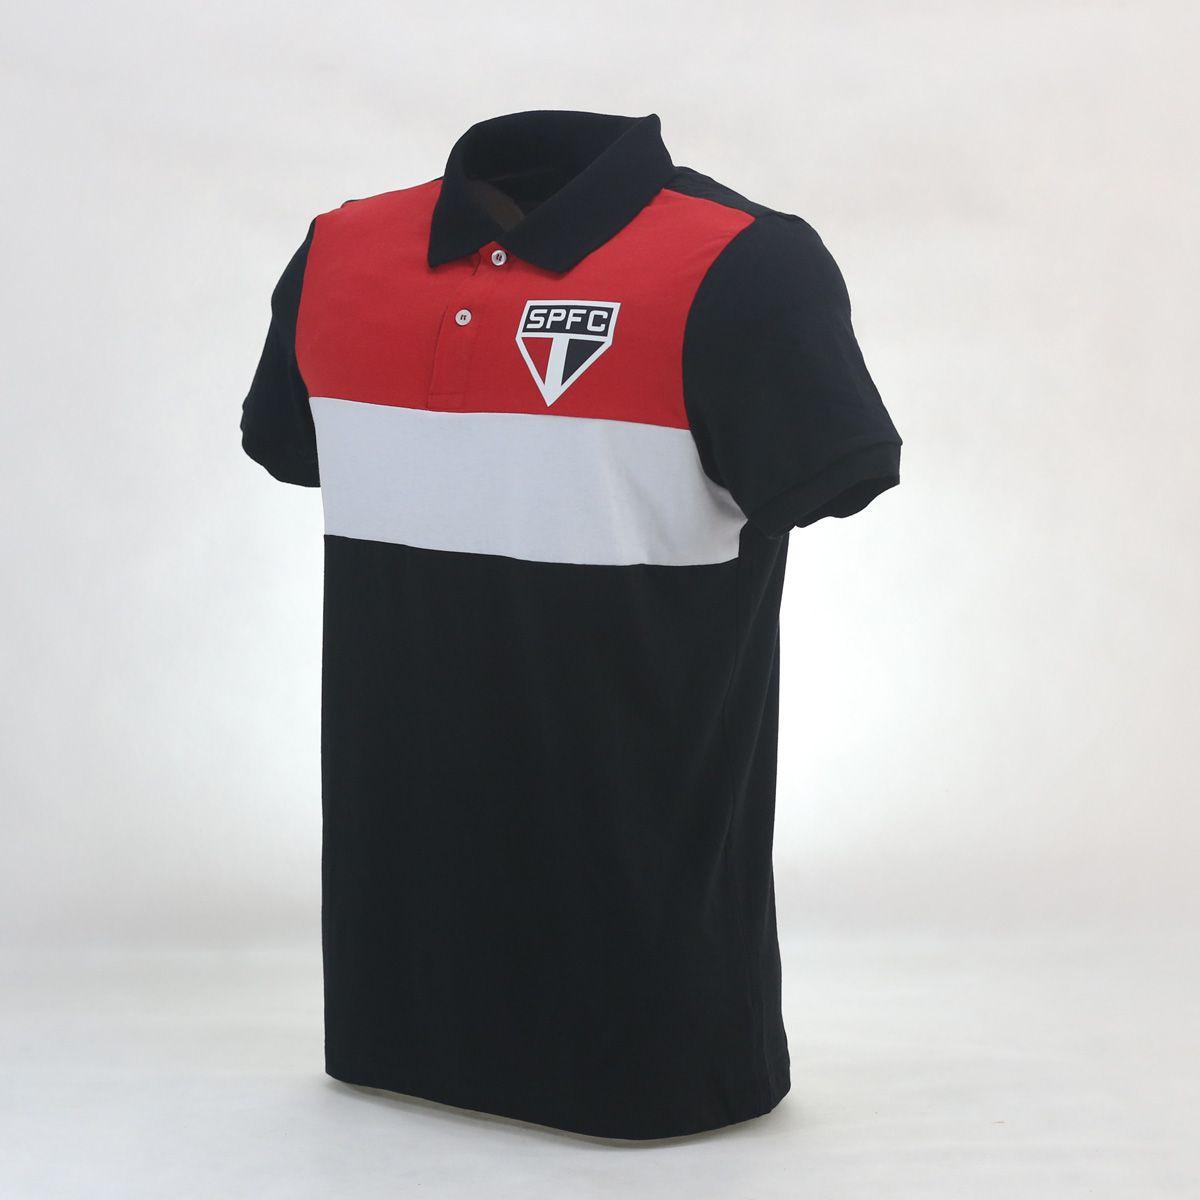 4c033440e7a3ea POLO SÃO PAULO RECORTES PRETA - Loja São Paulo FC